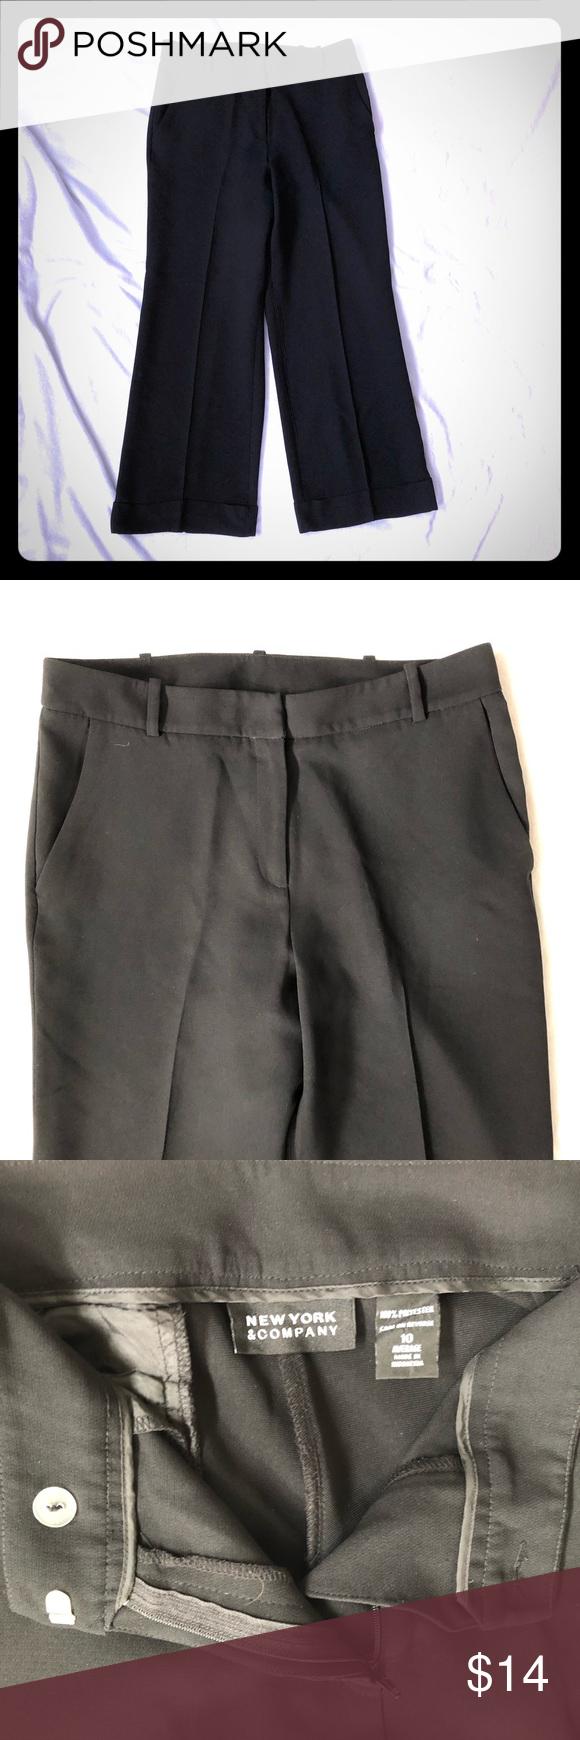 Belt Sizes 12-24 Leg 29 or 31 Wide Leg Flattering High Waist Stretch Palazzo Pants//Trousers